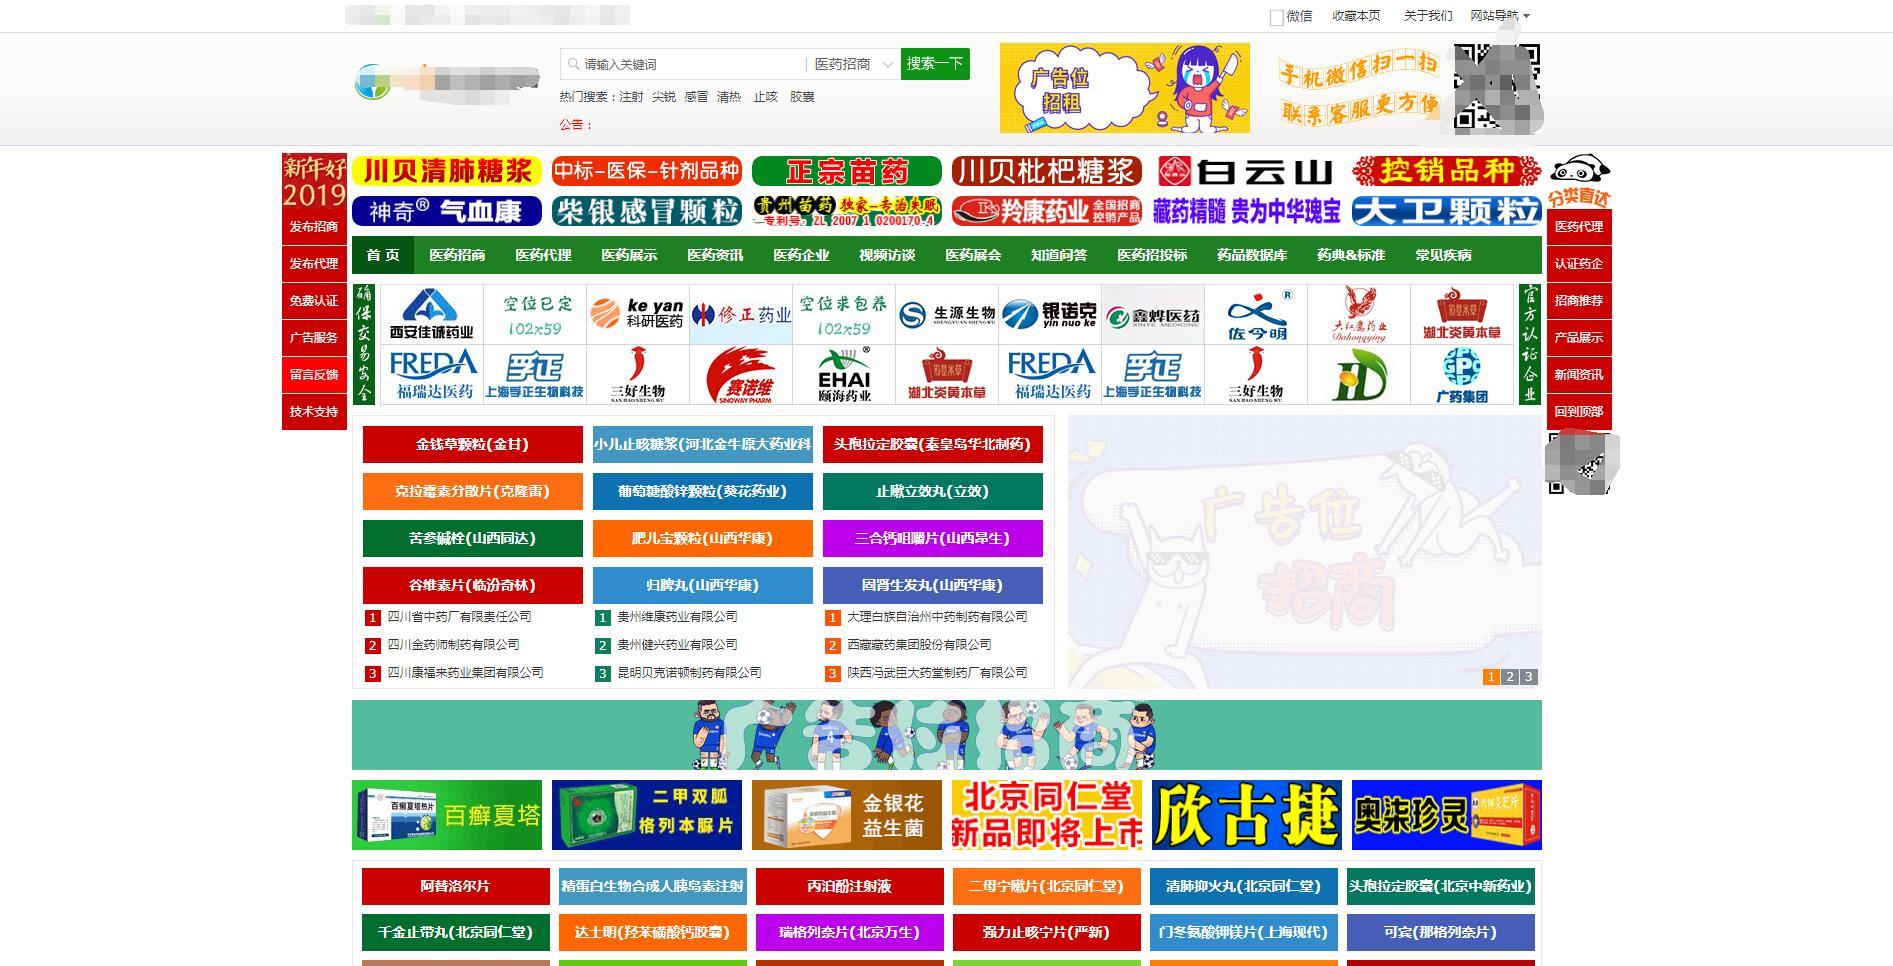 B2B-医药类招商网站建设案例